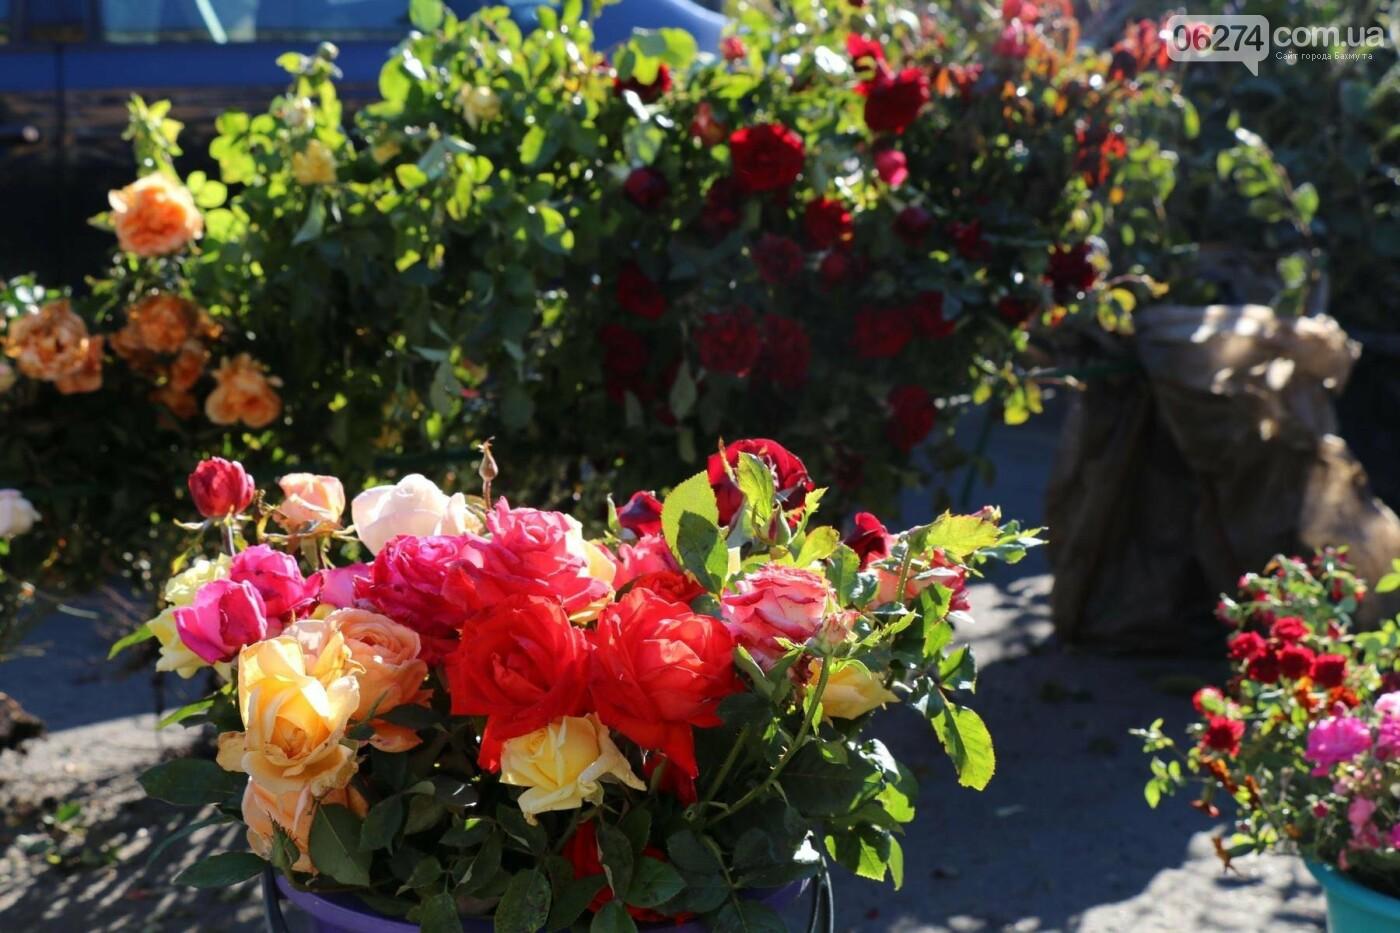 В Бахмуте прошла ярмарка «День садовода» (ФОТО), фото-4